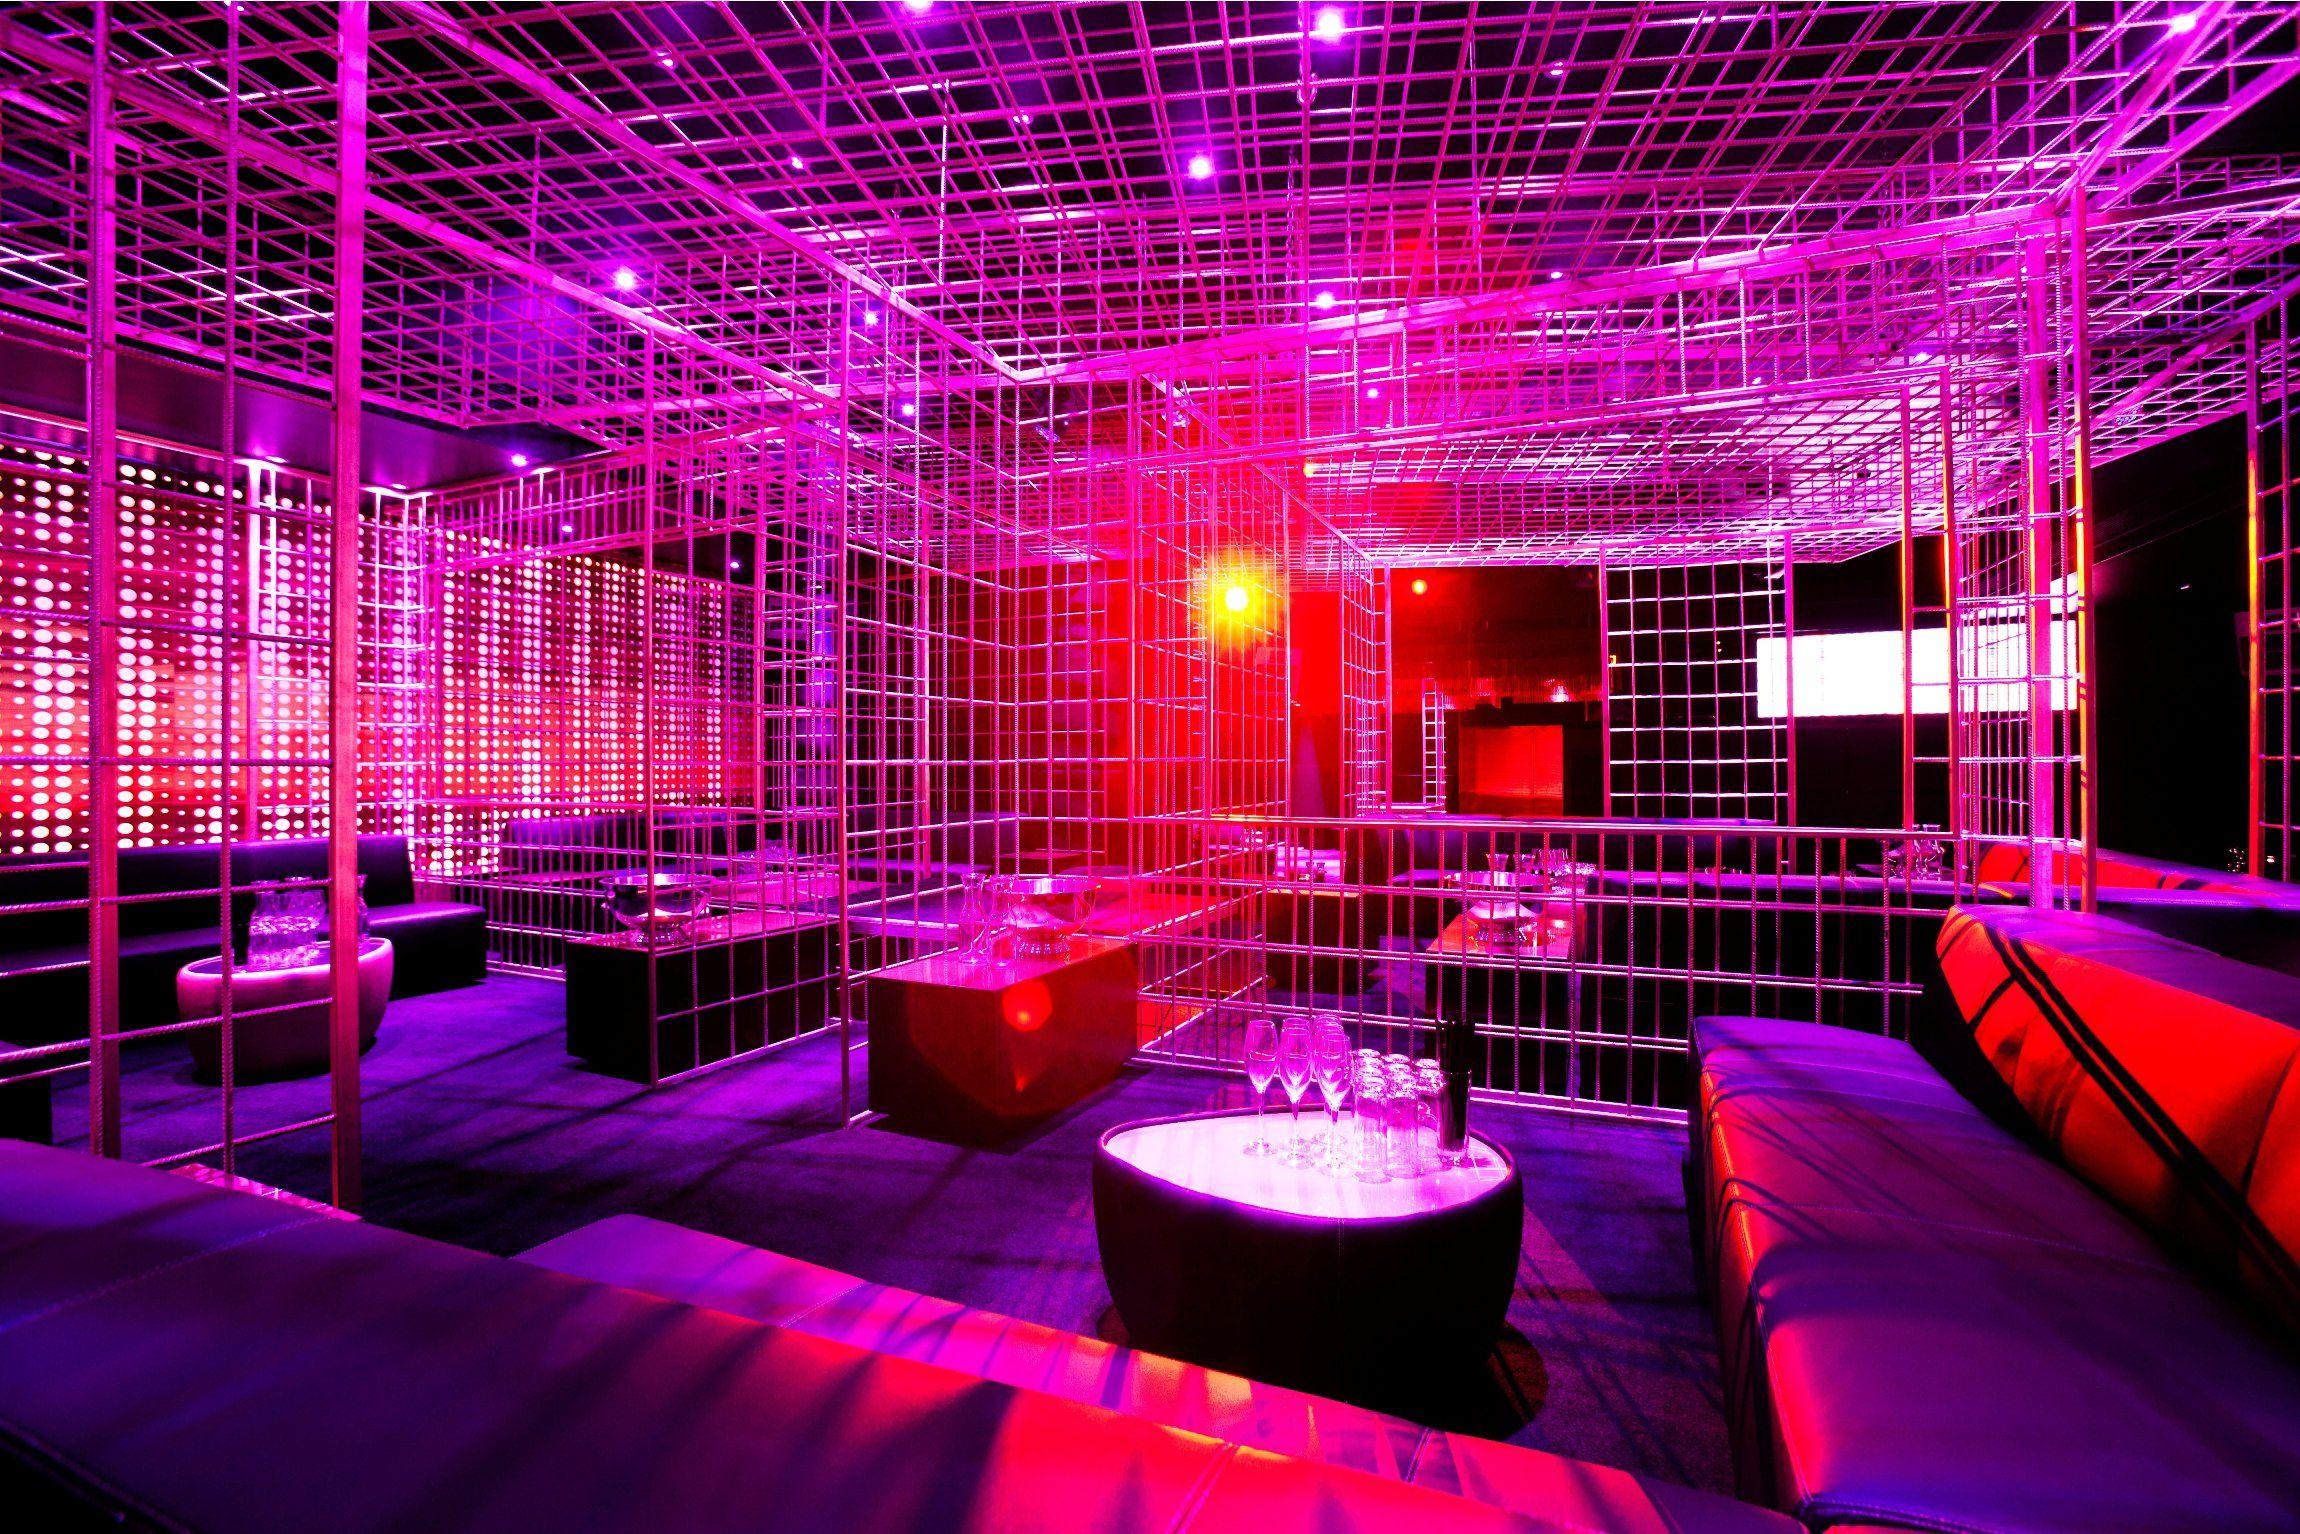 Dise o club nocturno iluminaci n club nocturno dise o de disco night club sistemas de - Discoteca ozona madrid ...